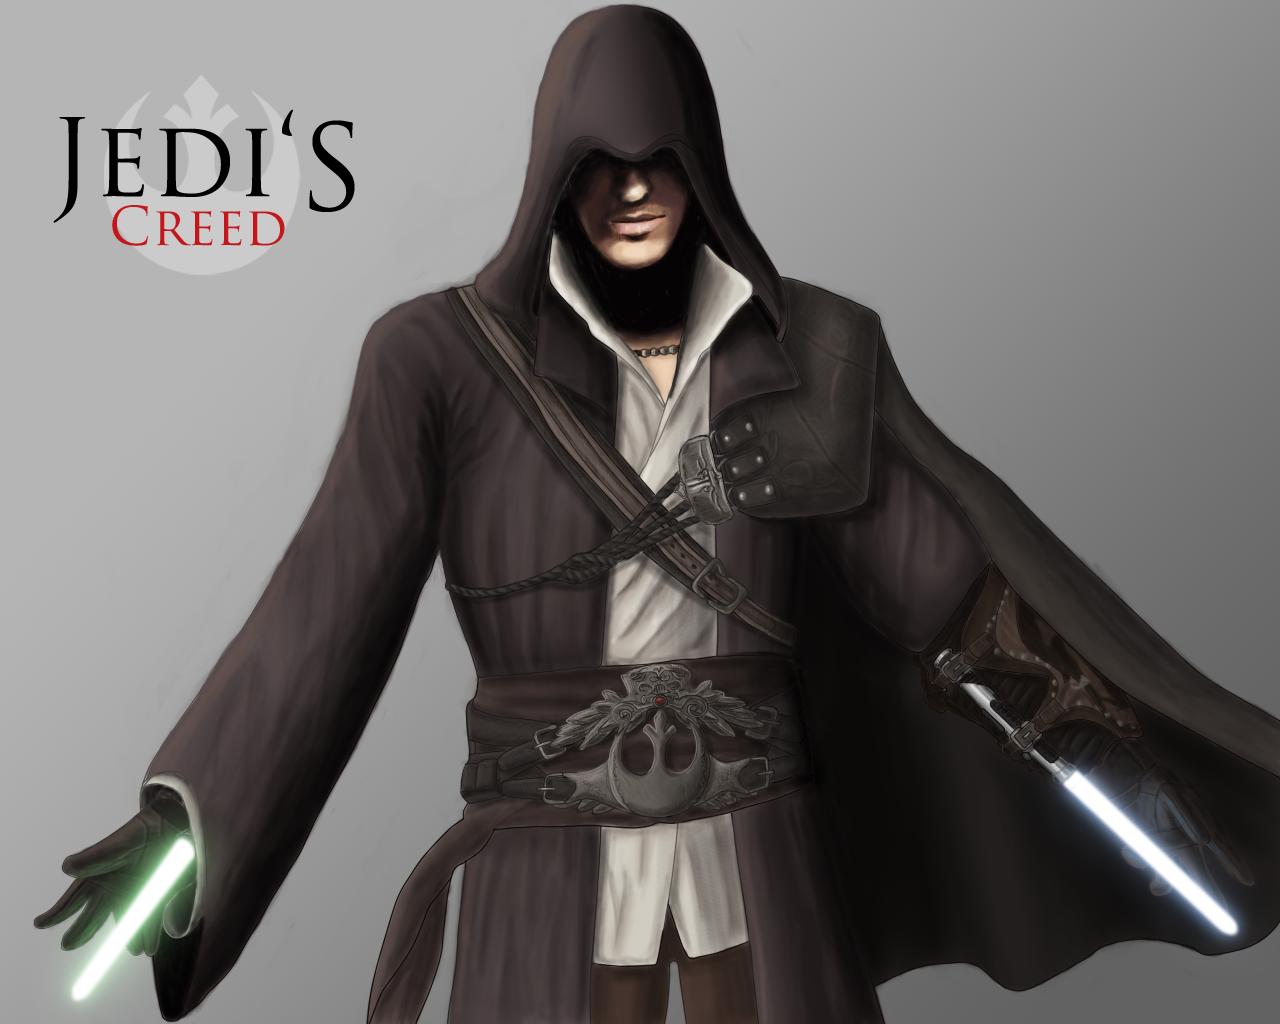 Quelques droleries starwarsienne en images - Page 3 Jedi__s_Creed__Ezio_Auditore_by_JackJasra